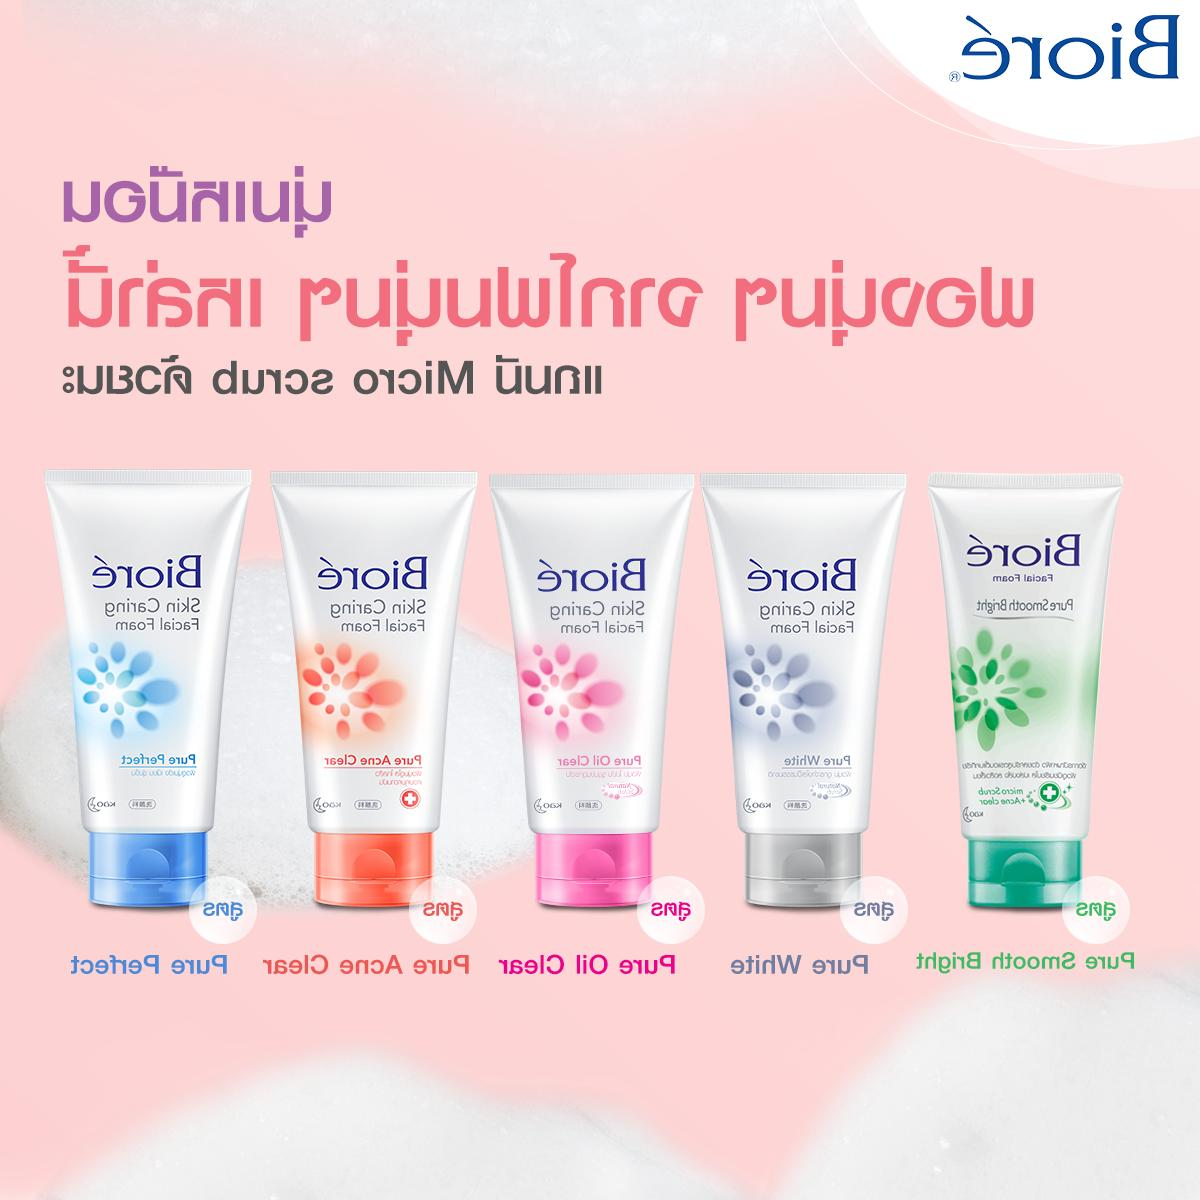 Biore new face white clear oil facial cleansing foam